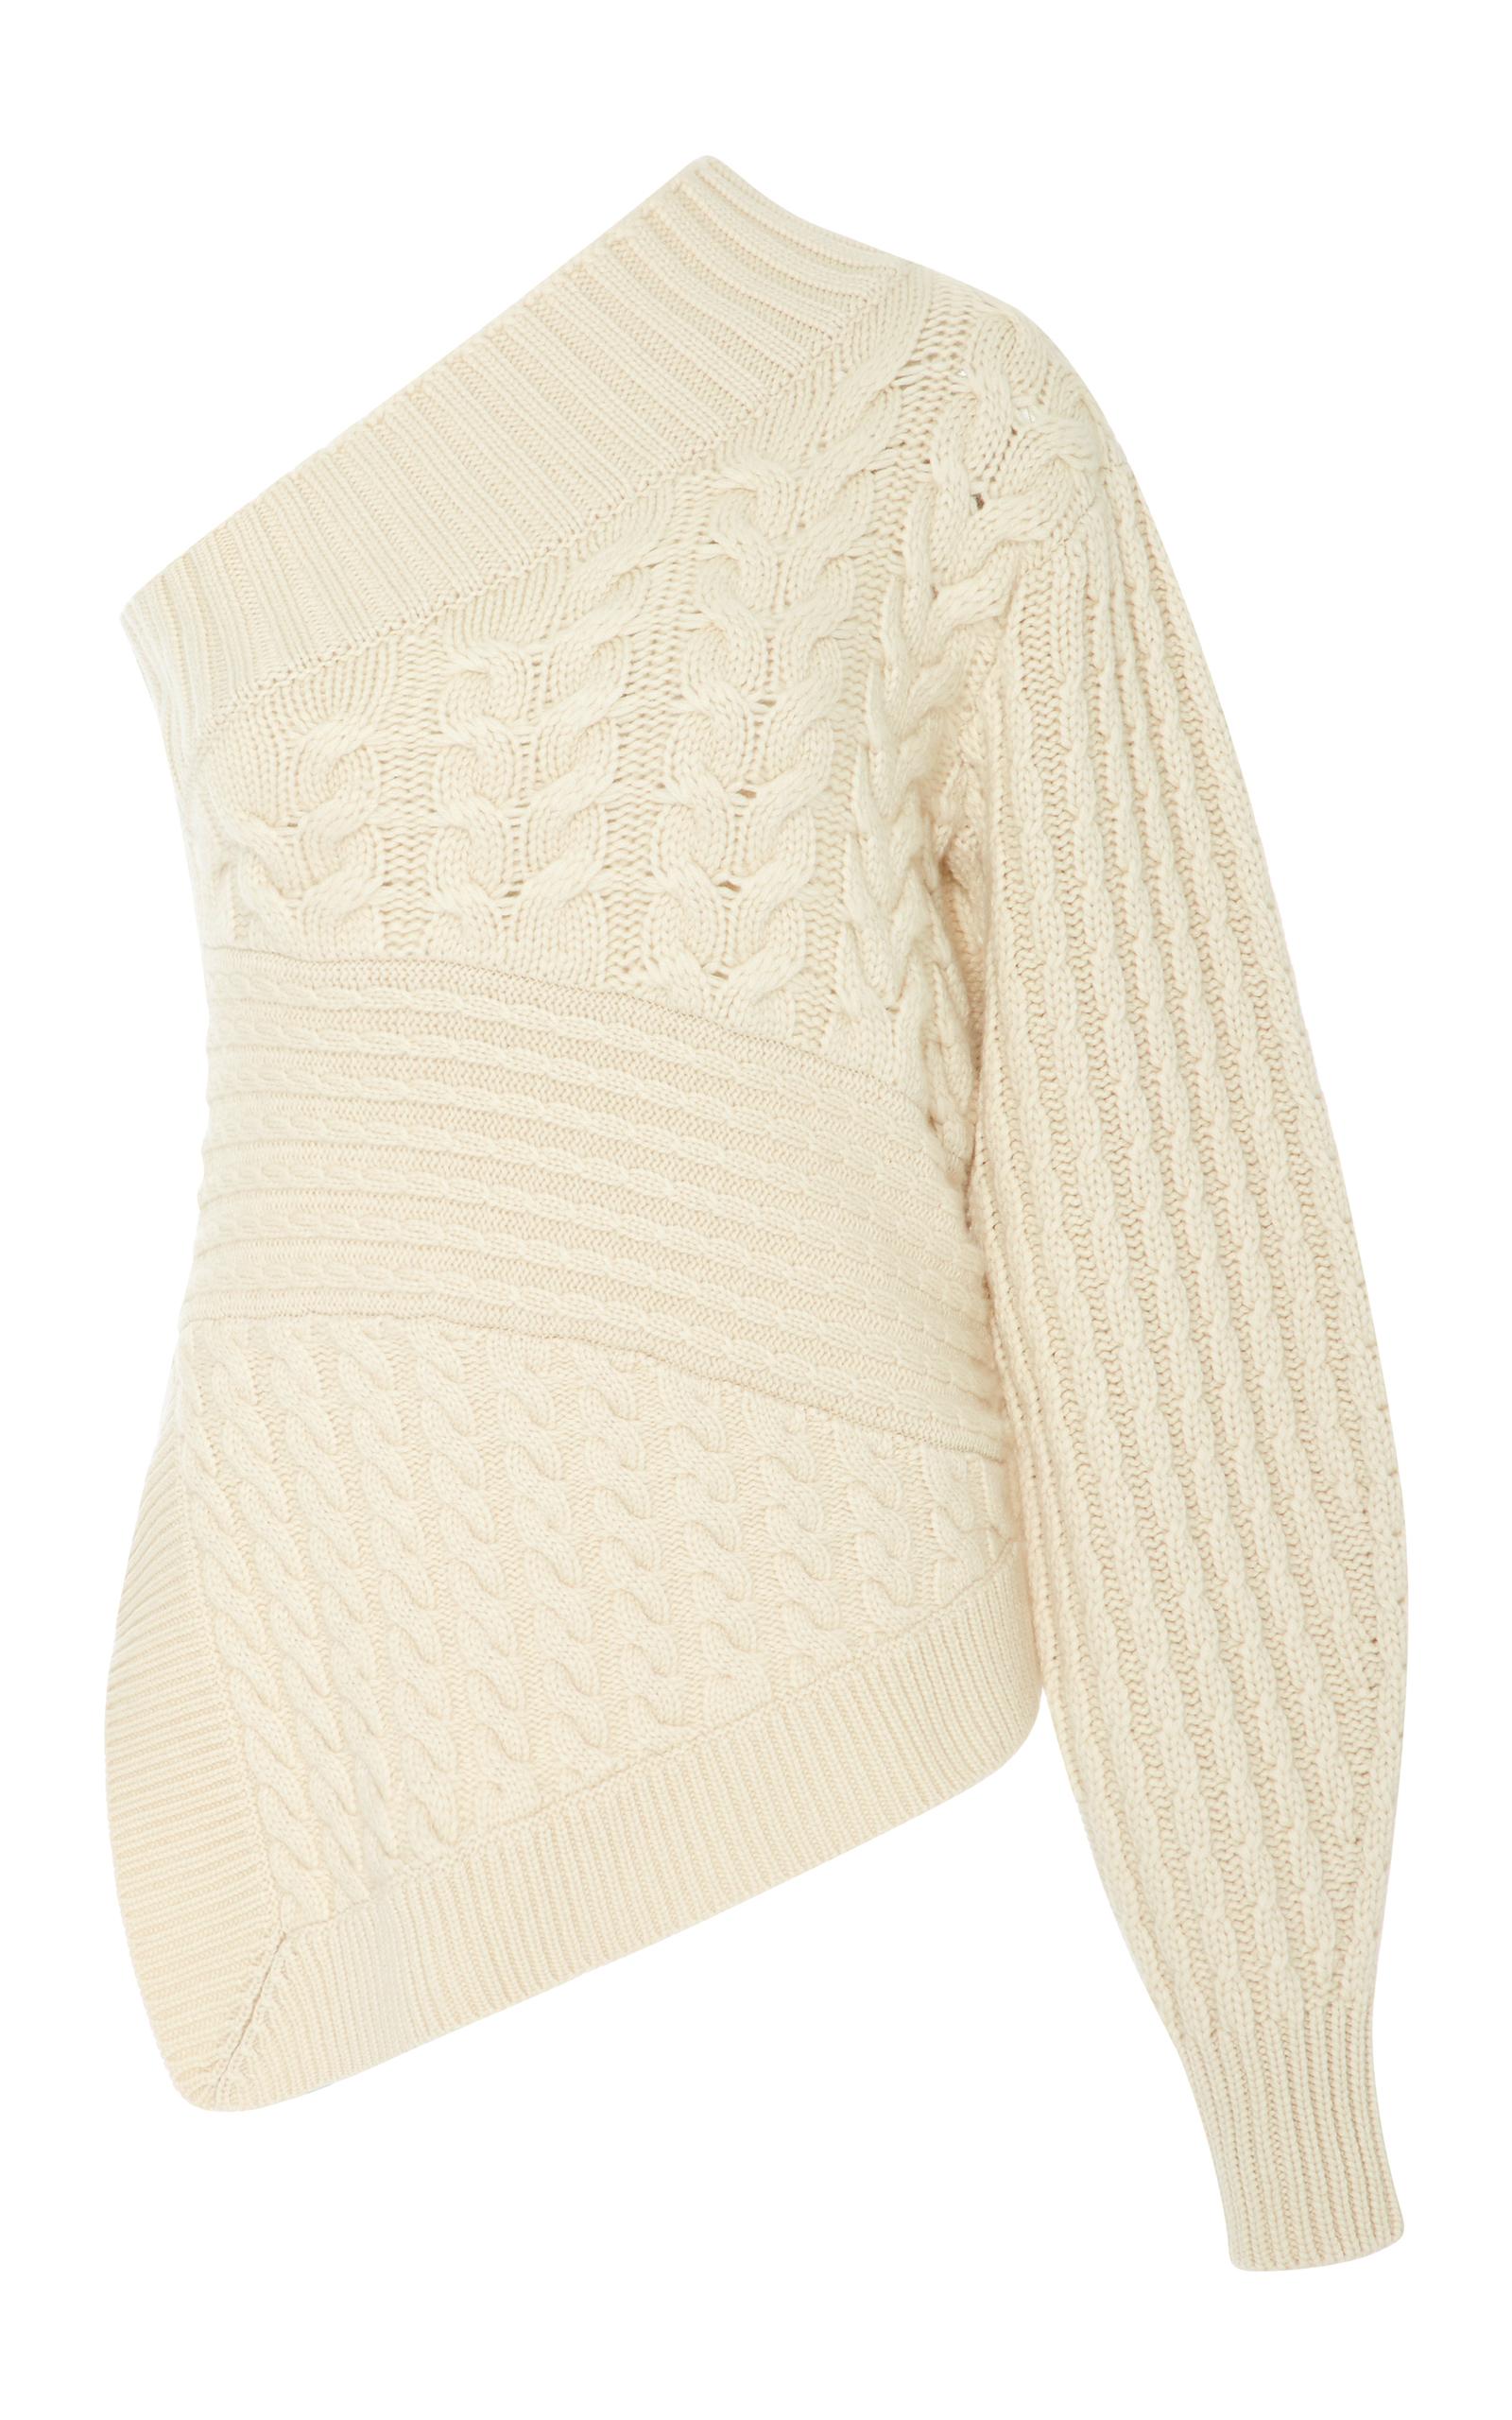 f16694b194579e One-Shoulder Cable-Knit Cashmere Sweater by Burberry   Moda Operandi